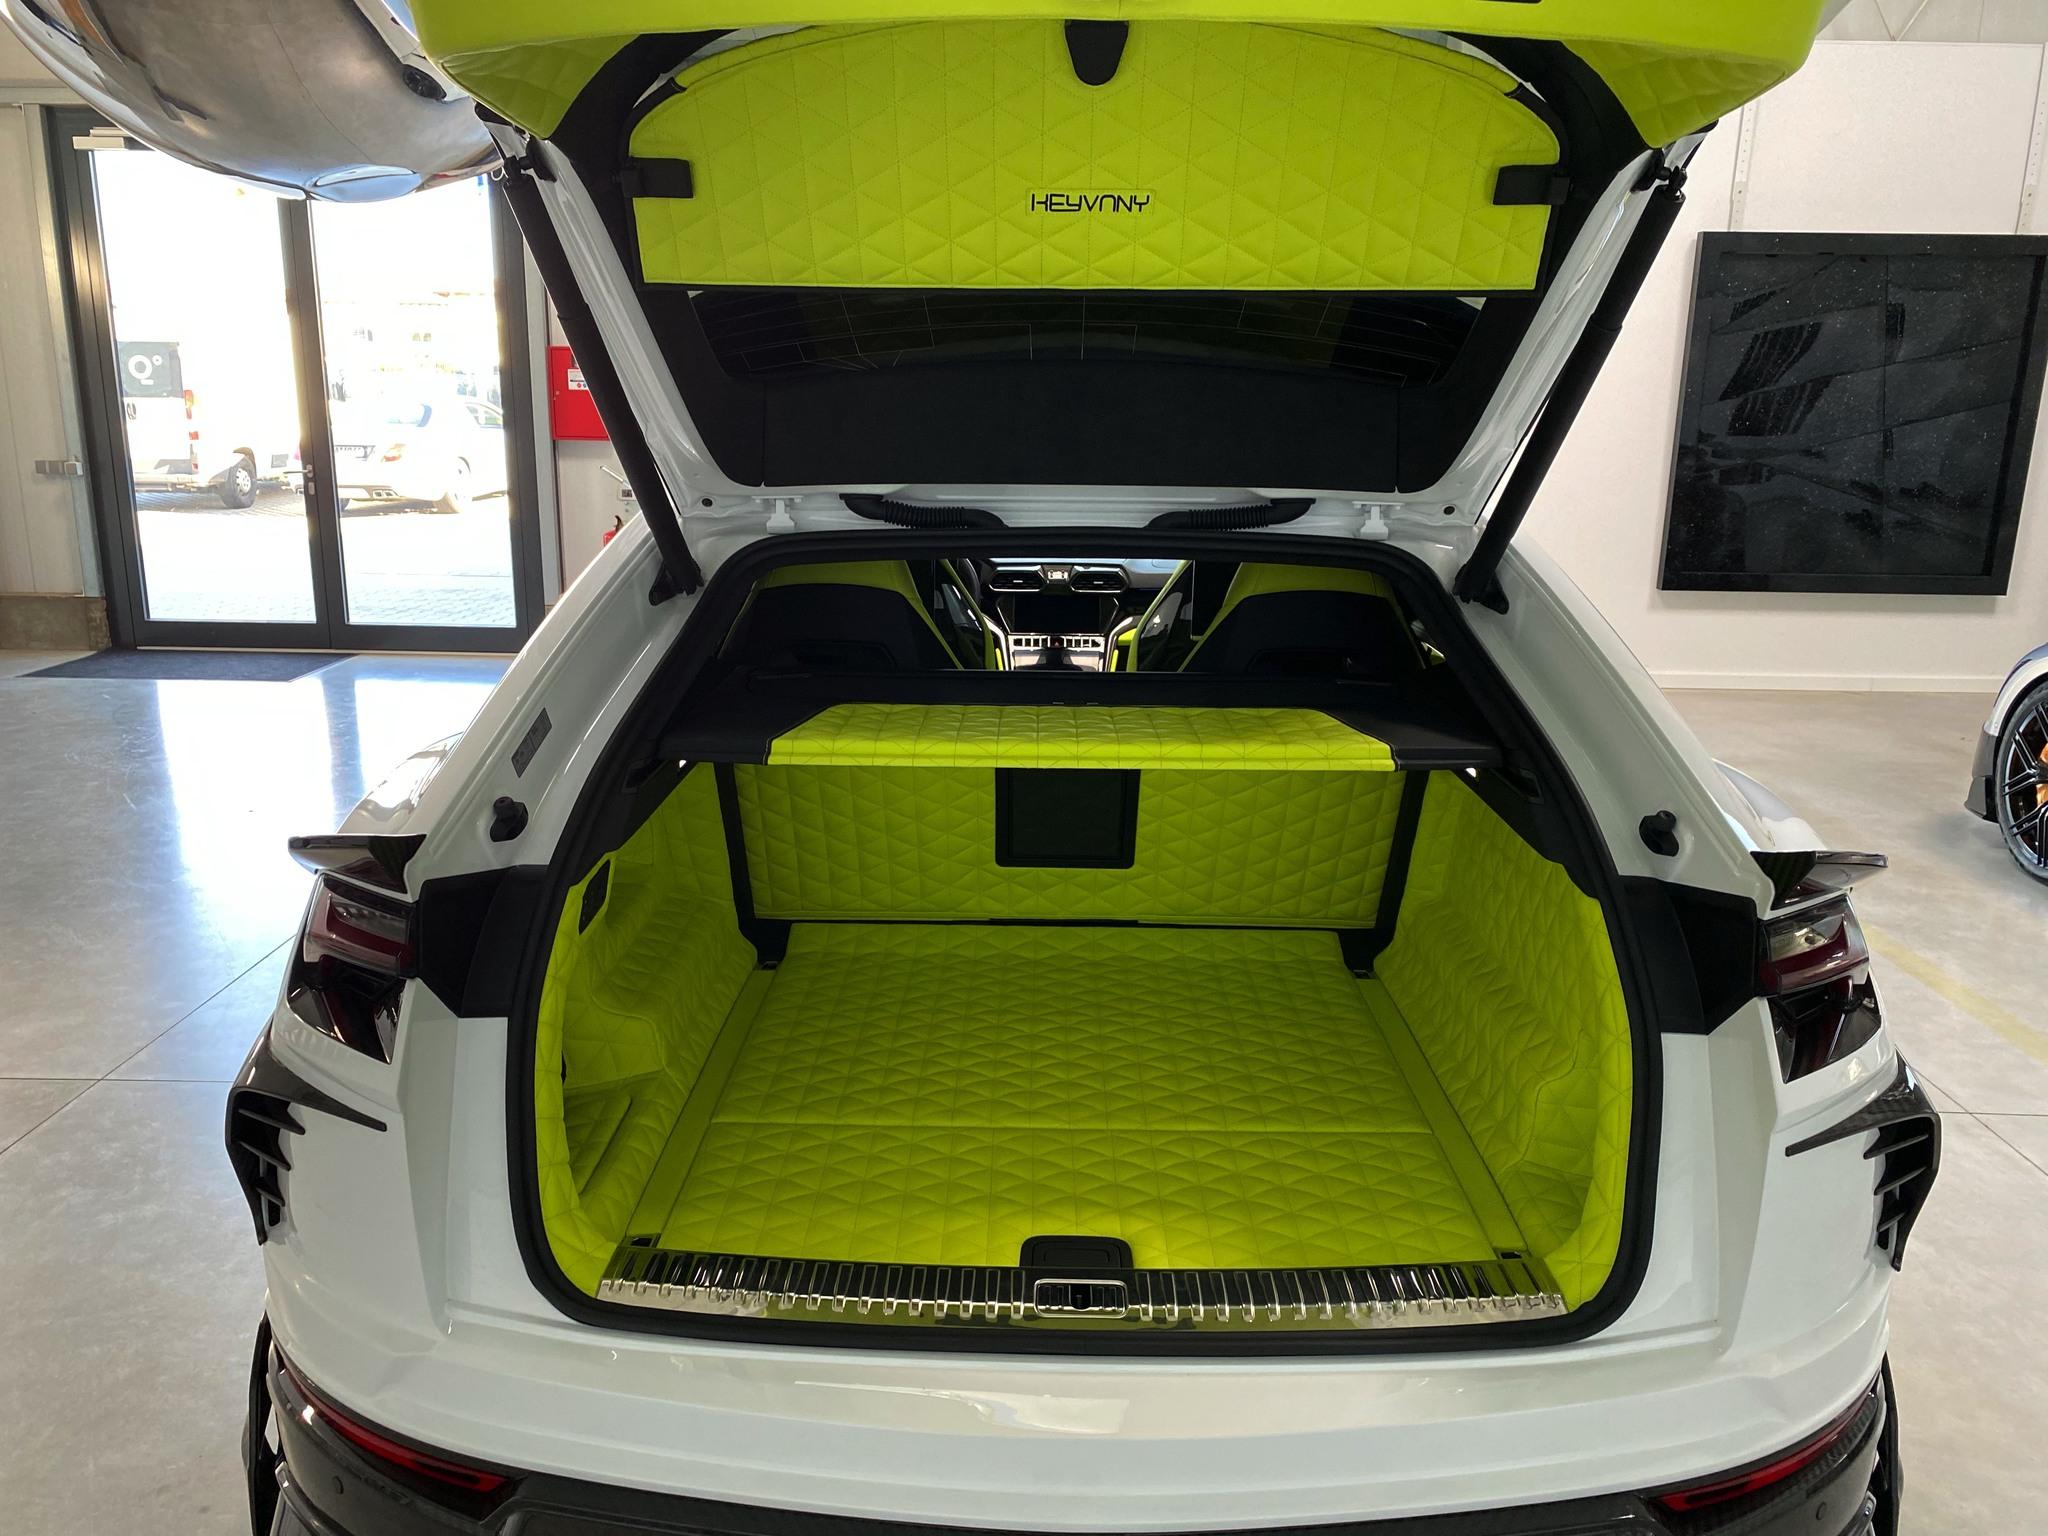 Keyvany body kit for Lamborghini Urus latest model